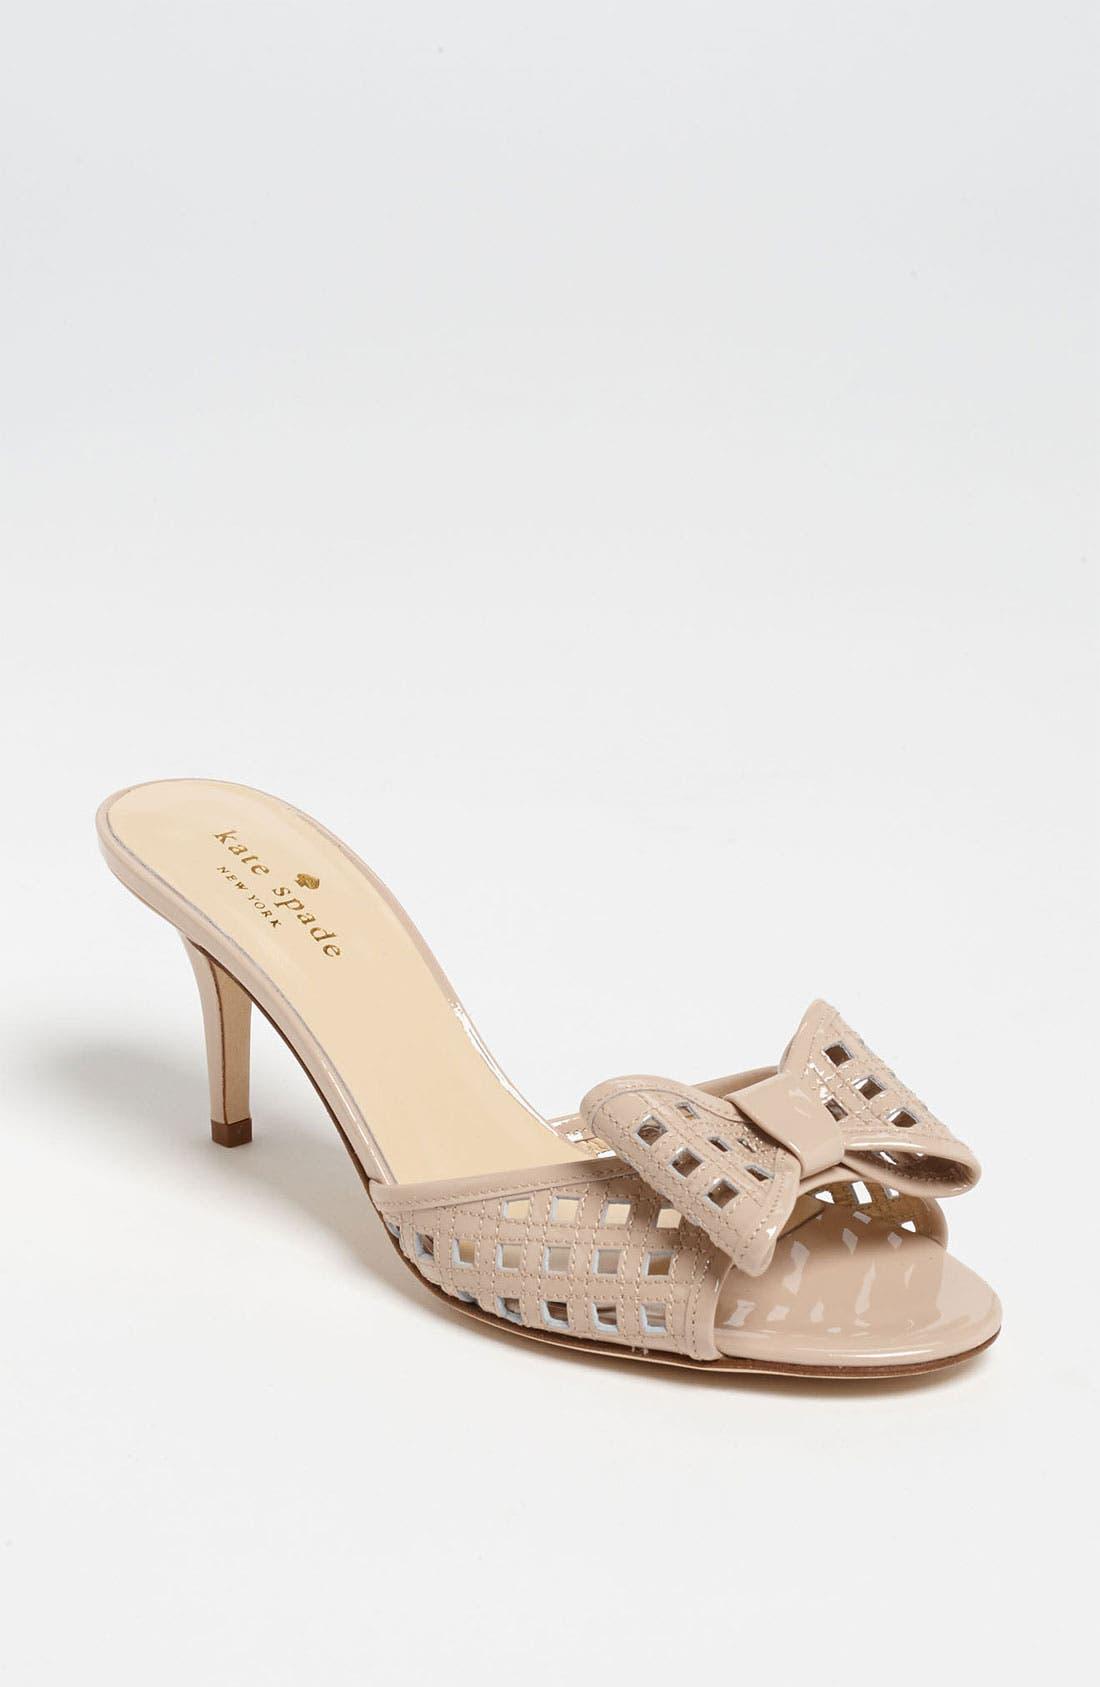 Alternate Image 1 Selected - kate spade new york 'mailyn' sandal